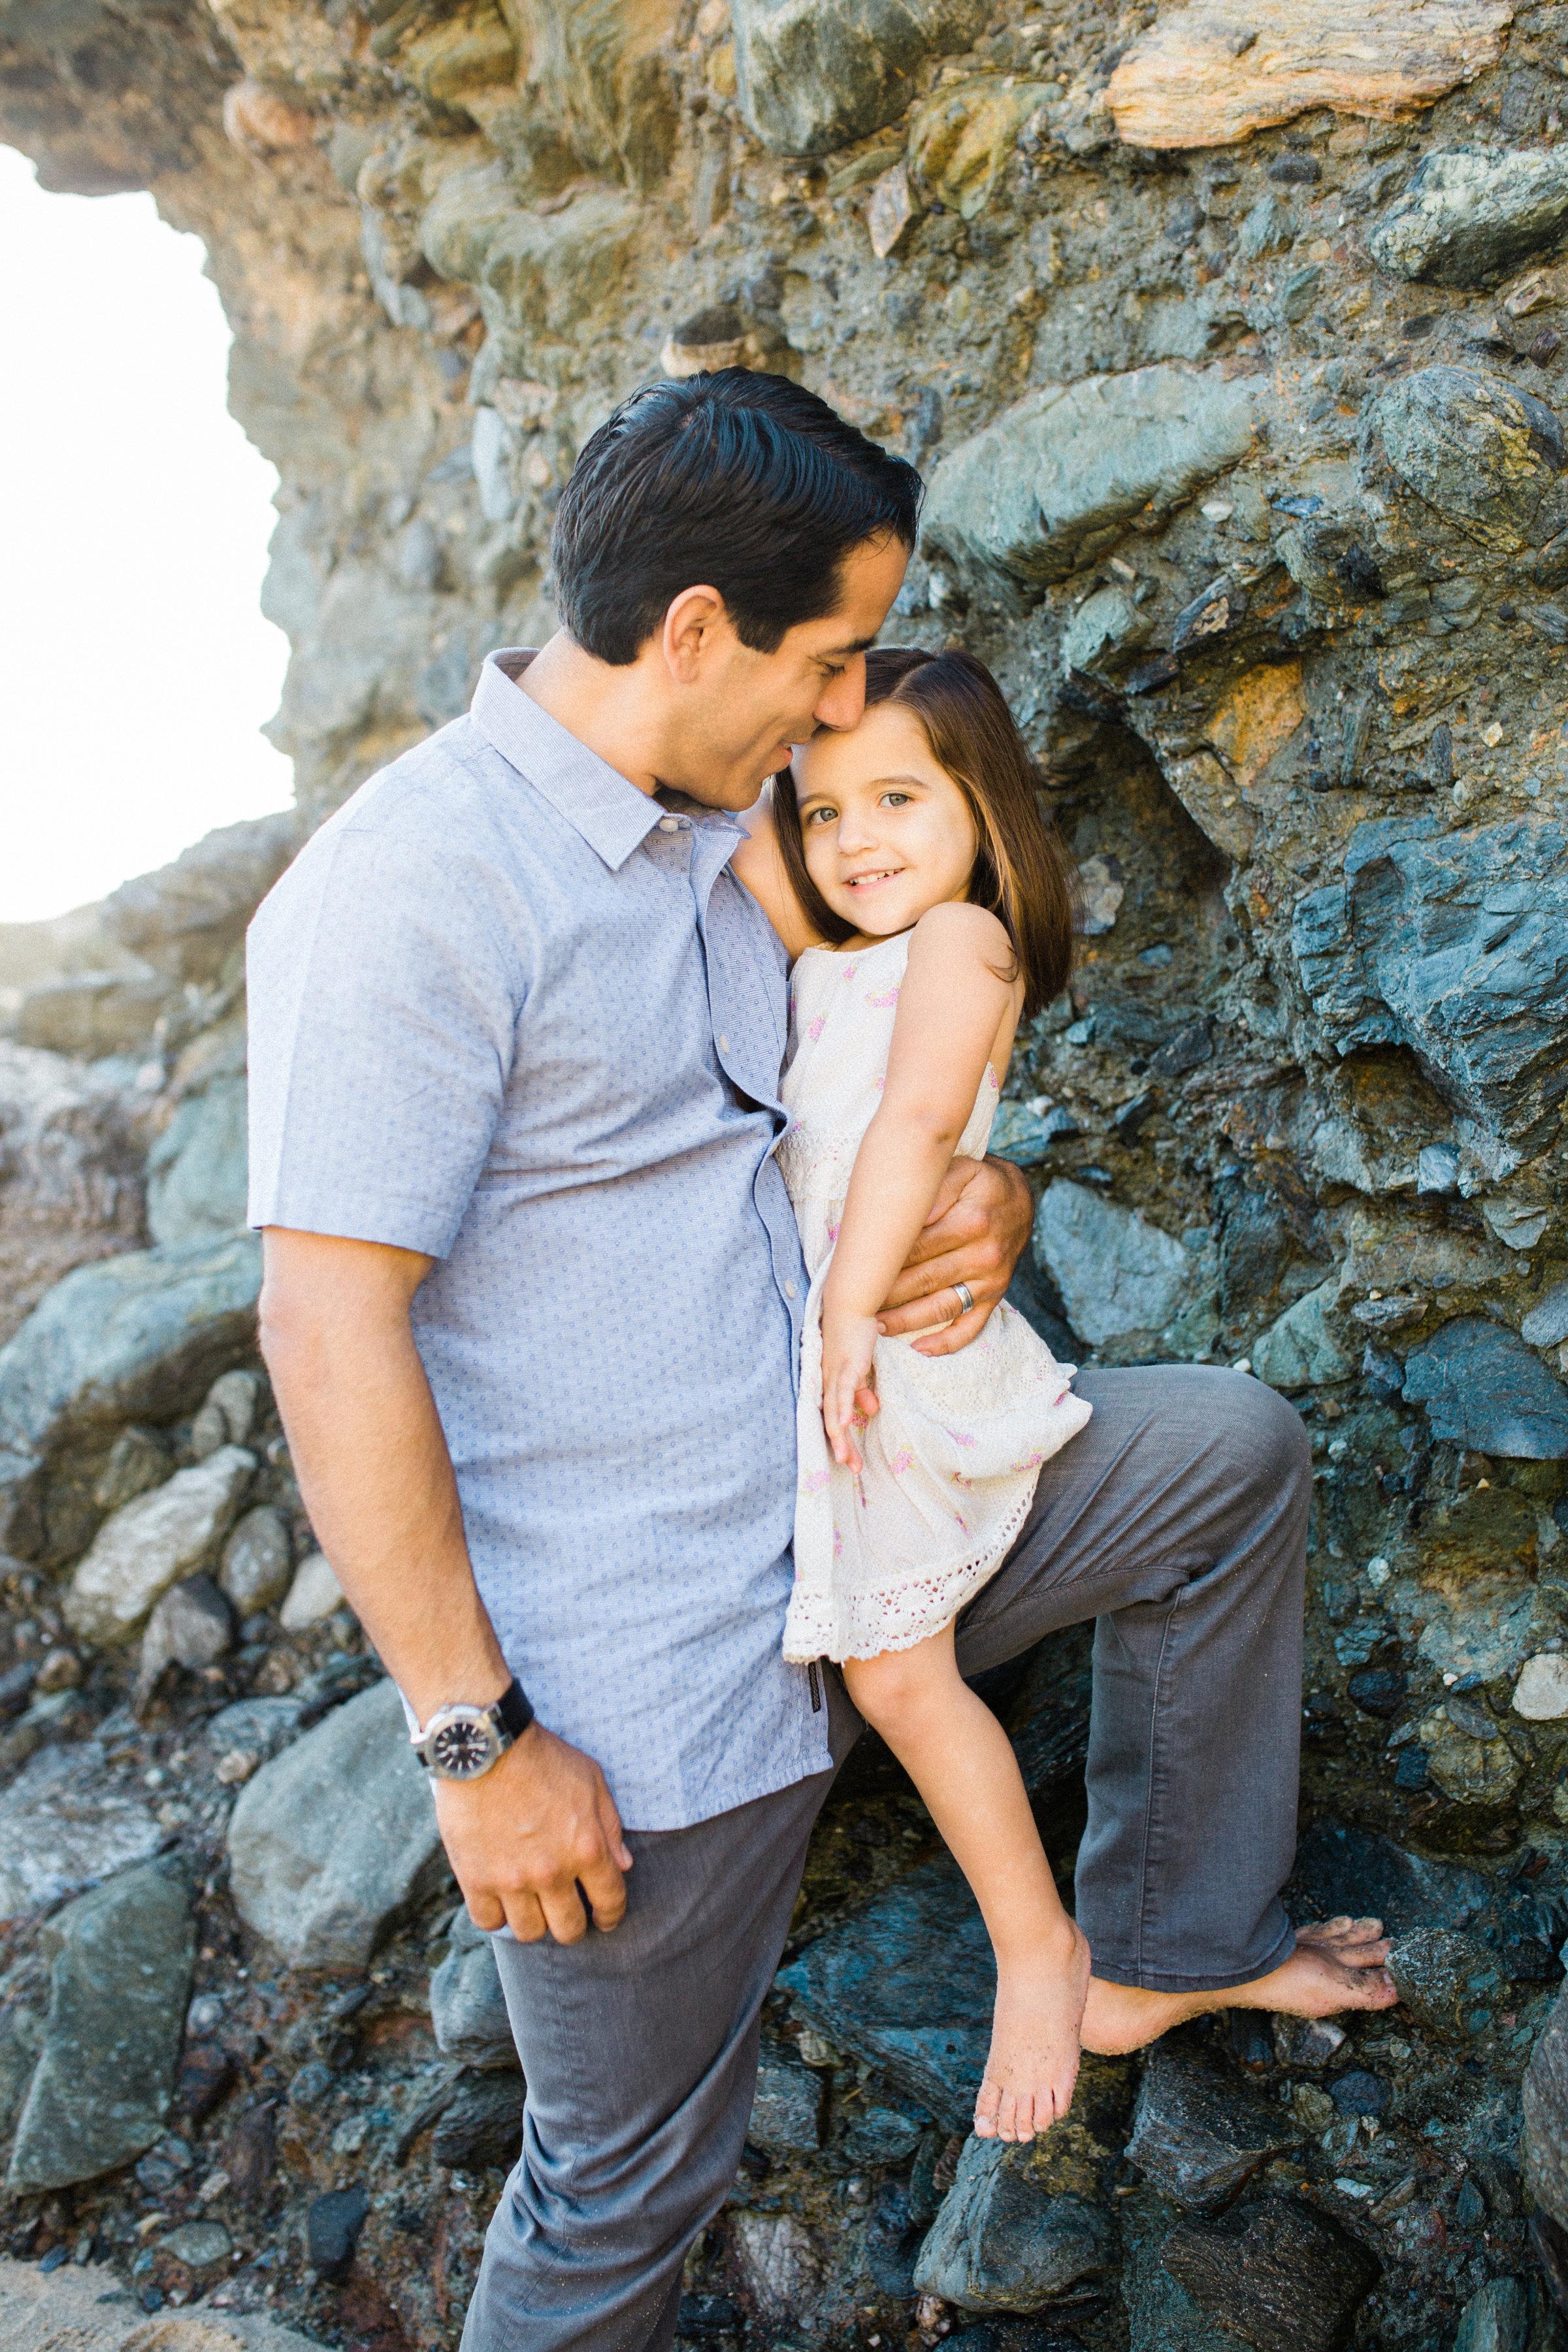 ruiz-family_laguna_los-angeles-beach-family-photography-71.jpg